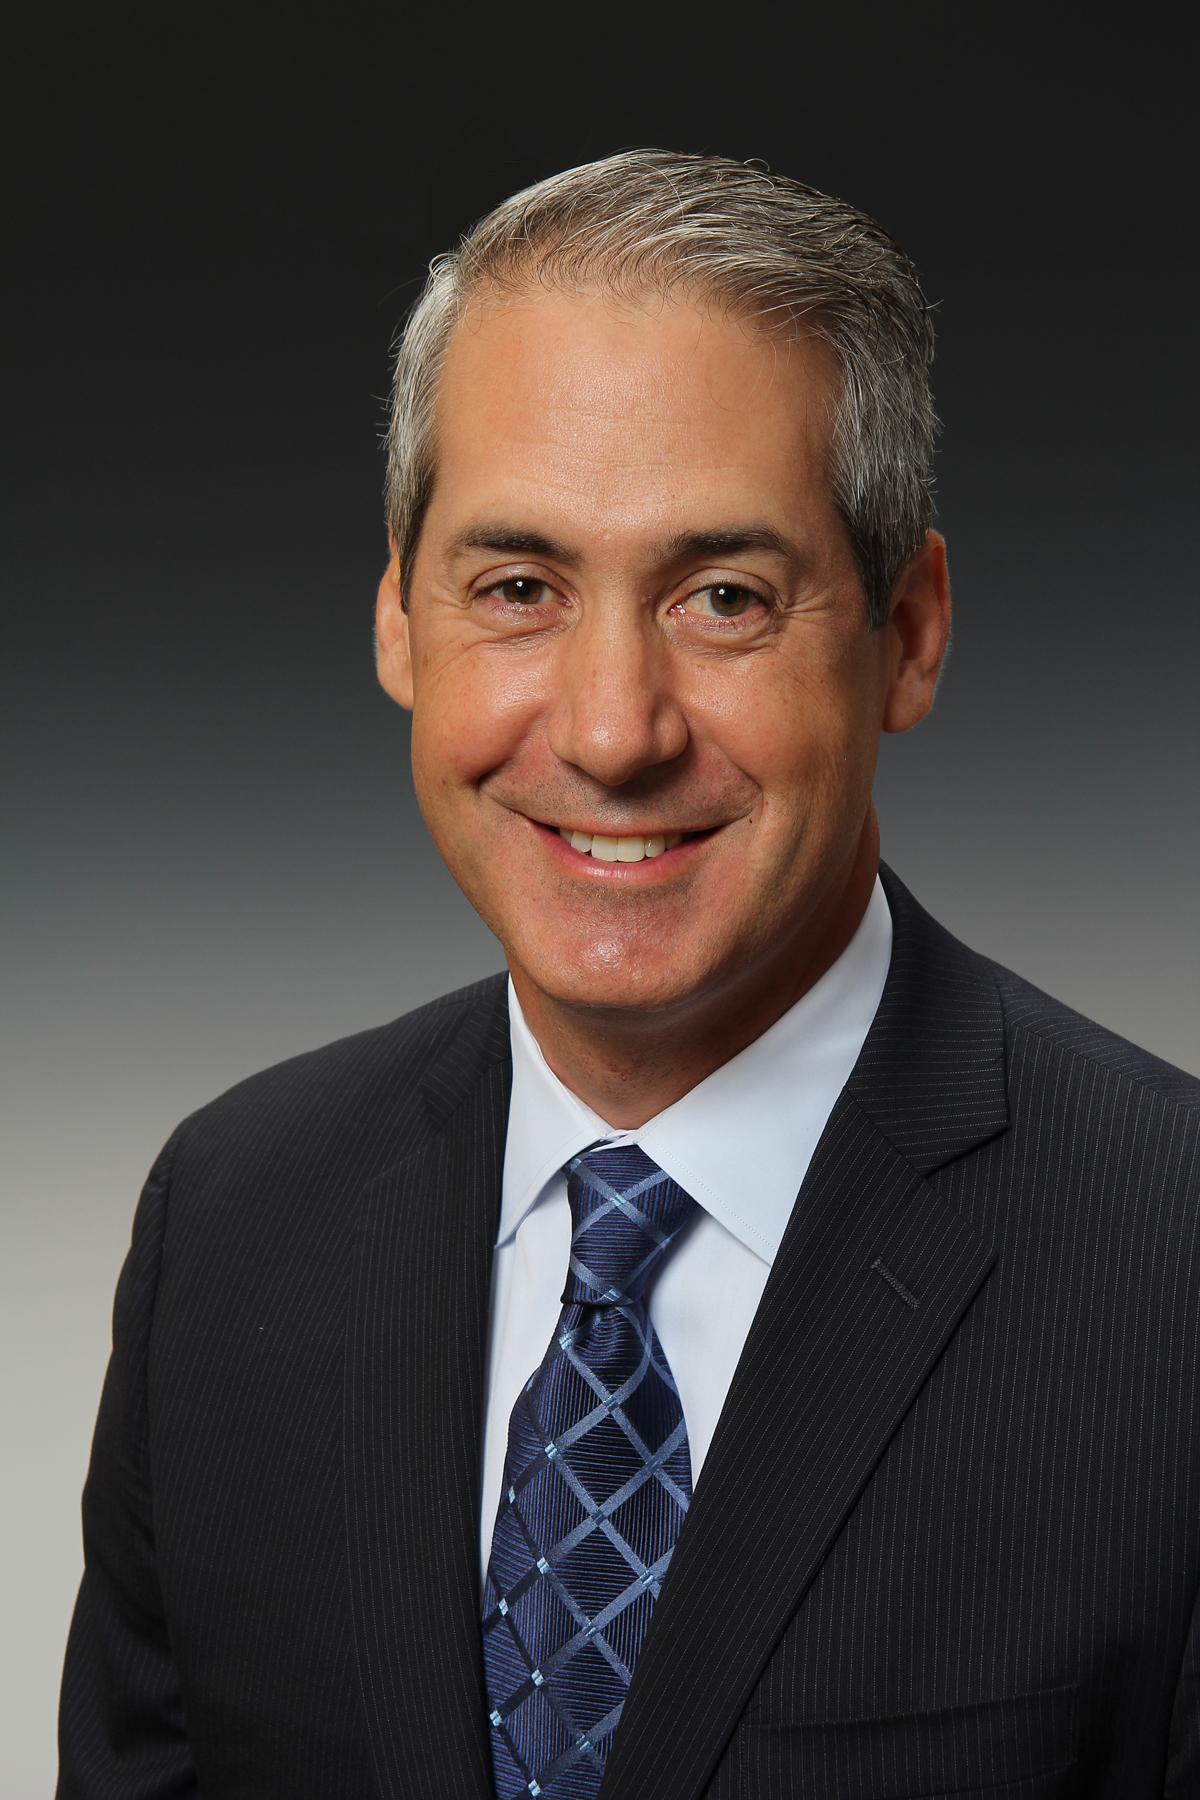 Tobin Richardson, president and CEO of the ZigBee Alliance